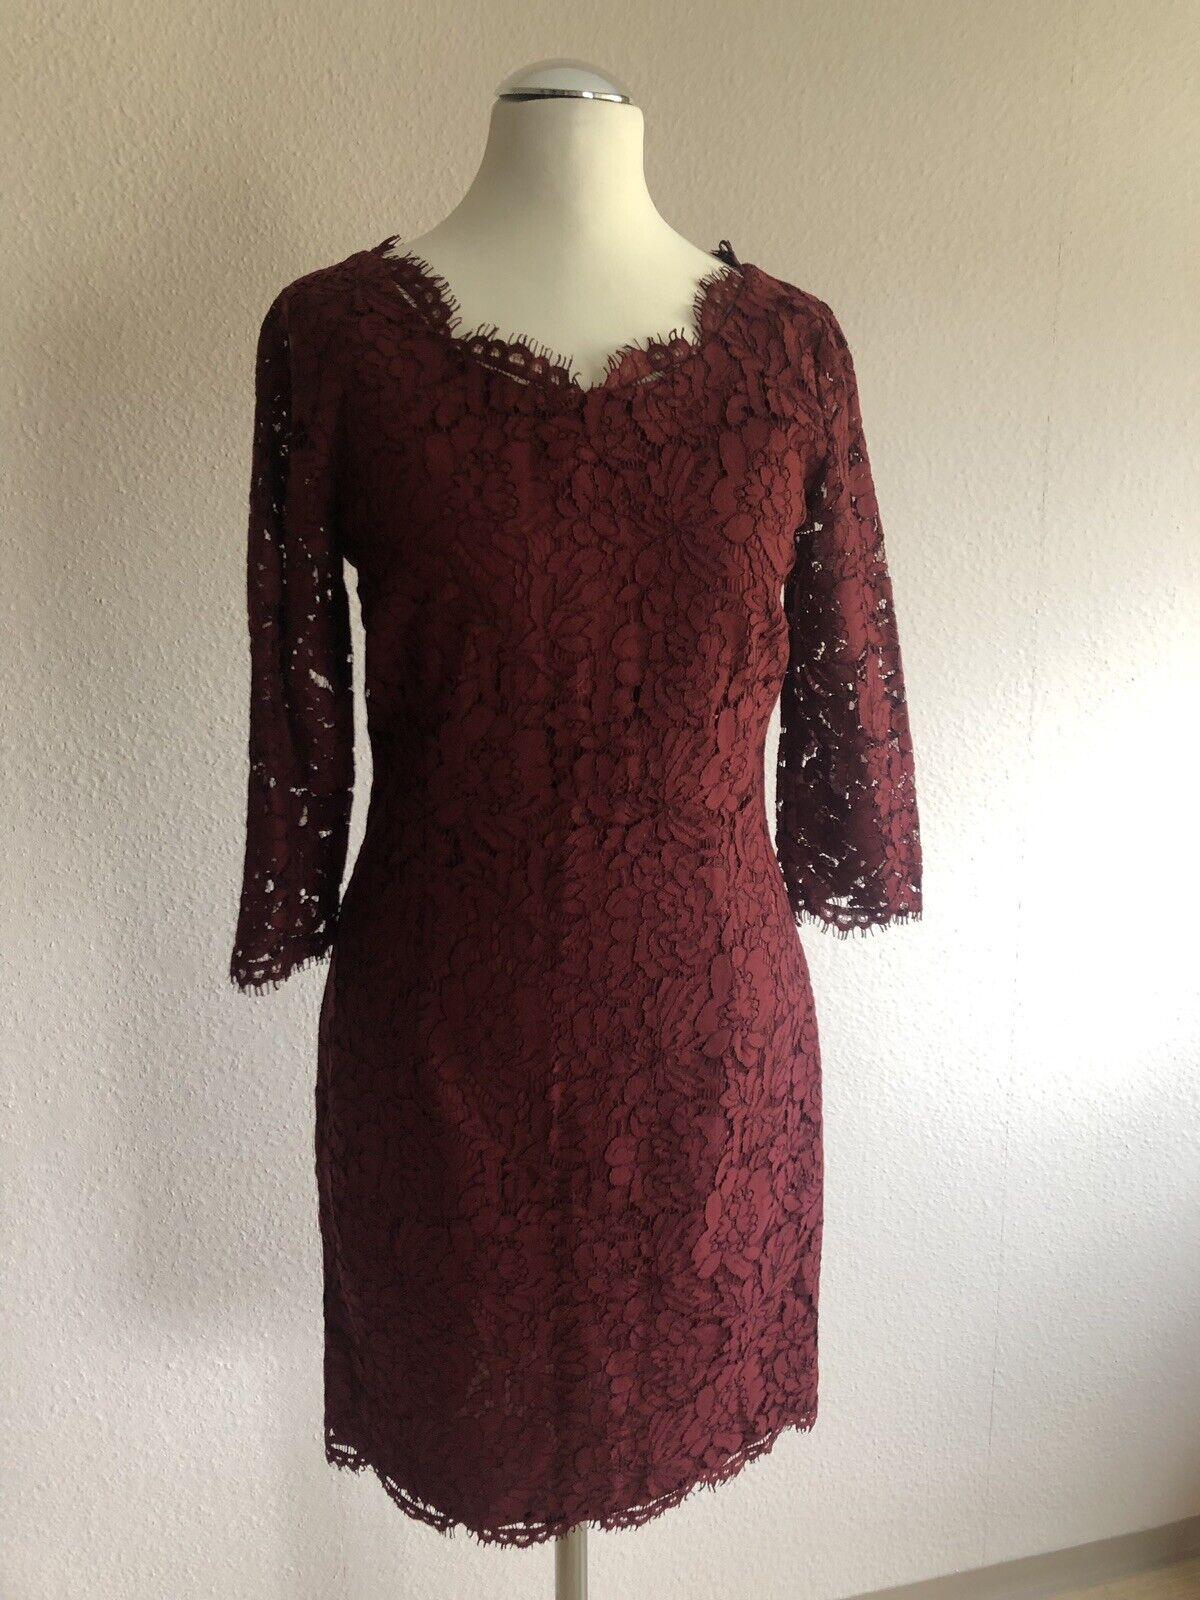 SET Kleid Gr. 34 XS OUISET Oui bordeaux Abendkleid Spitzenkleid Spitze NEU